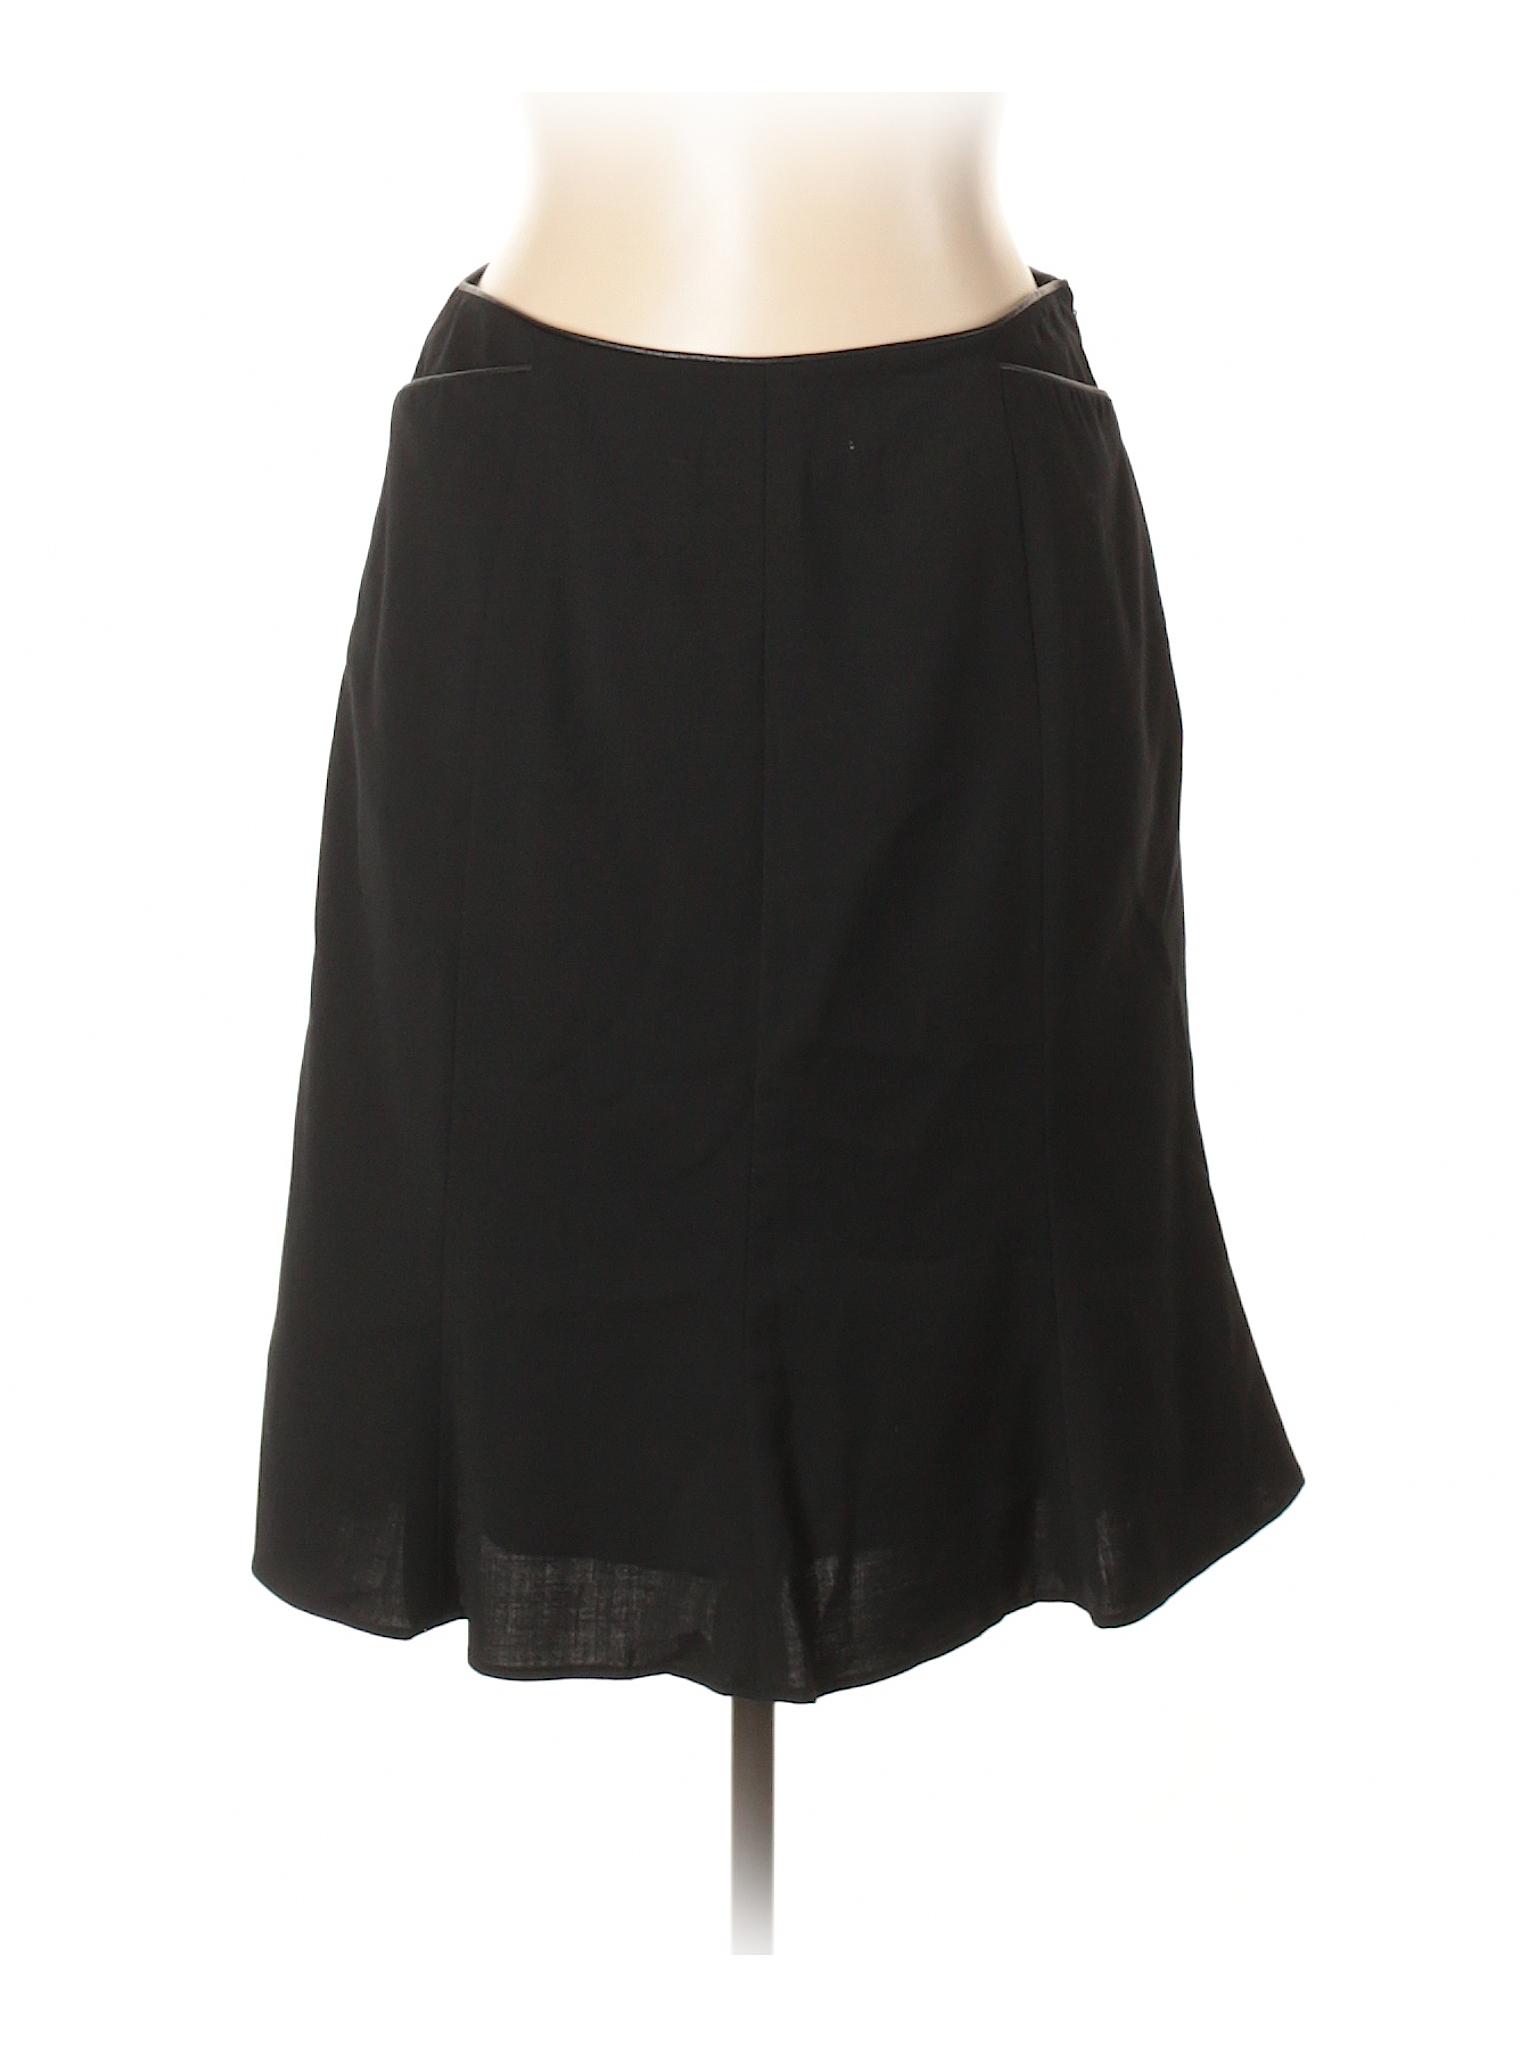 Klein Boutique Anne Casual Skirt leisure a7w0vqxwO